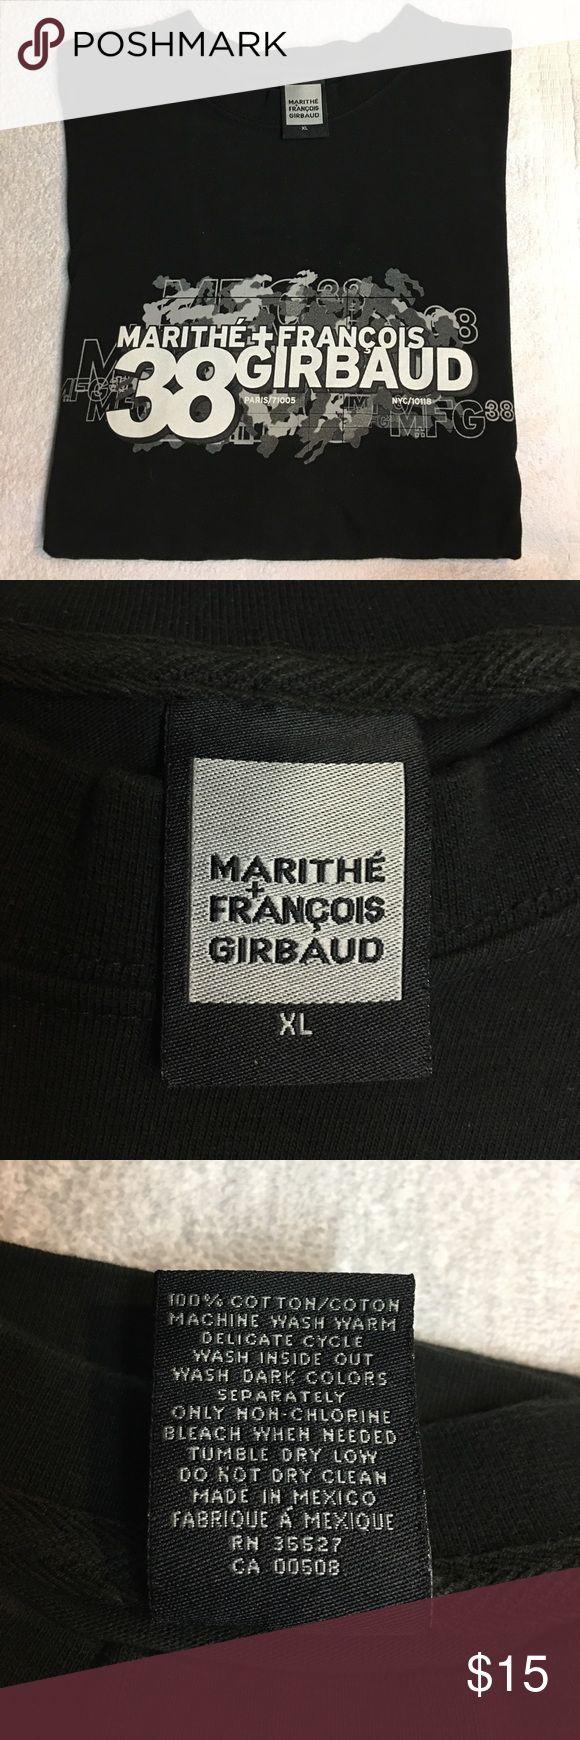 Marithe Francois Girbaud Men's T-Shirt Marithe Francois Girbaud Men's T-Shirt. GUC. No rips or tears. 100% Cotton. Machine washable. Smoke Free Home. Marithe Francois Girbaud Shirts Tees - Short Sleeve